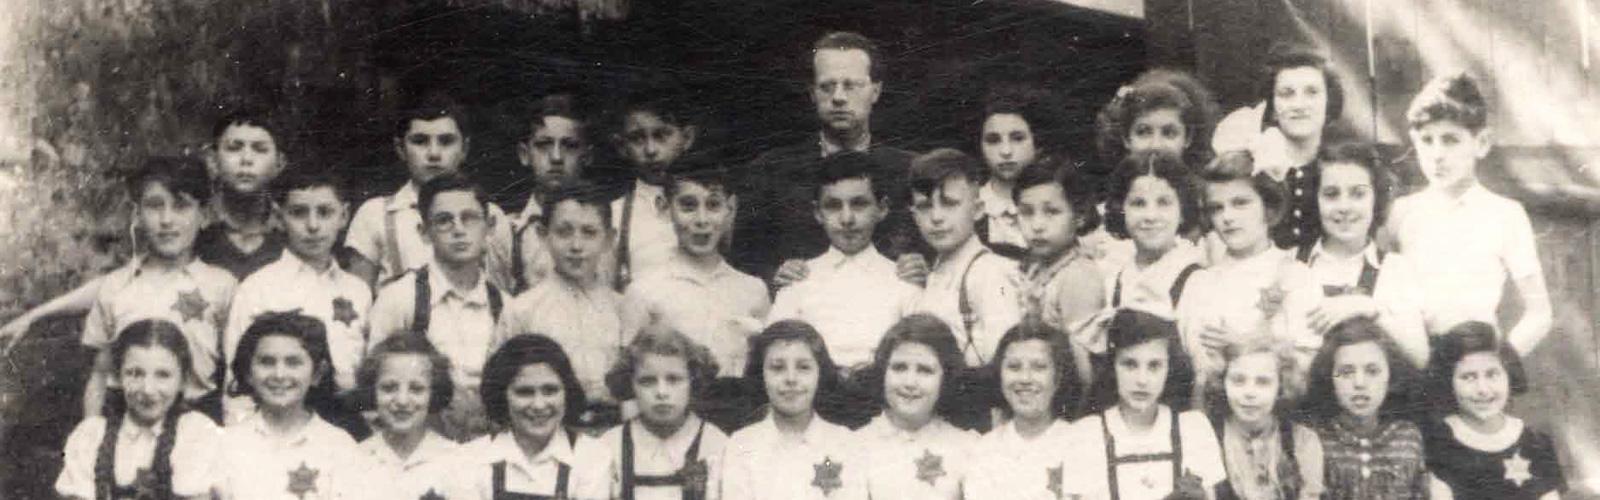 Memorial Scrolls Trust Class of 1942